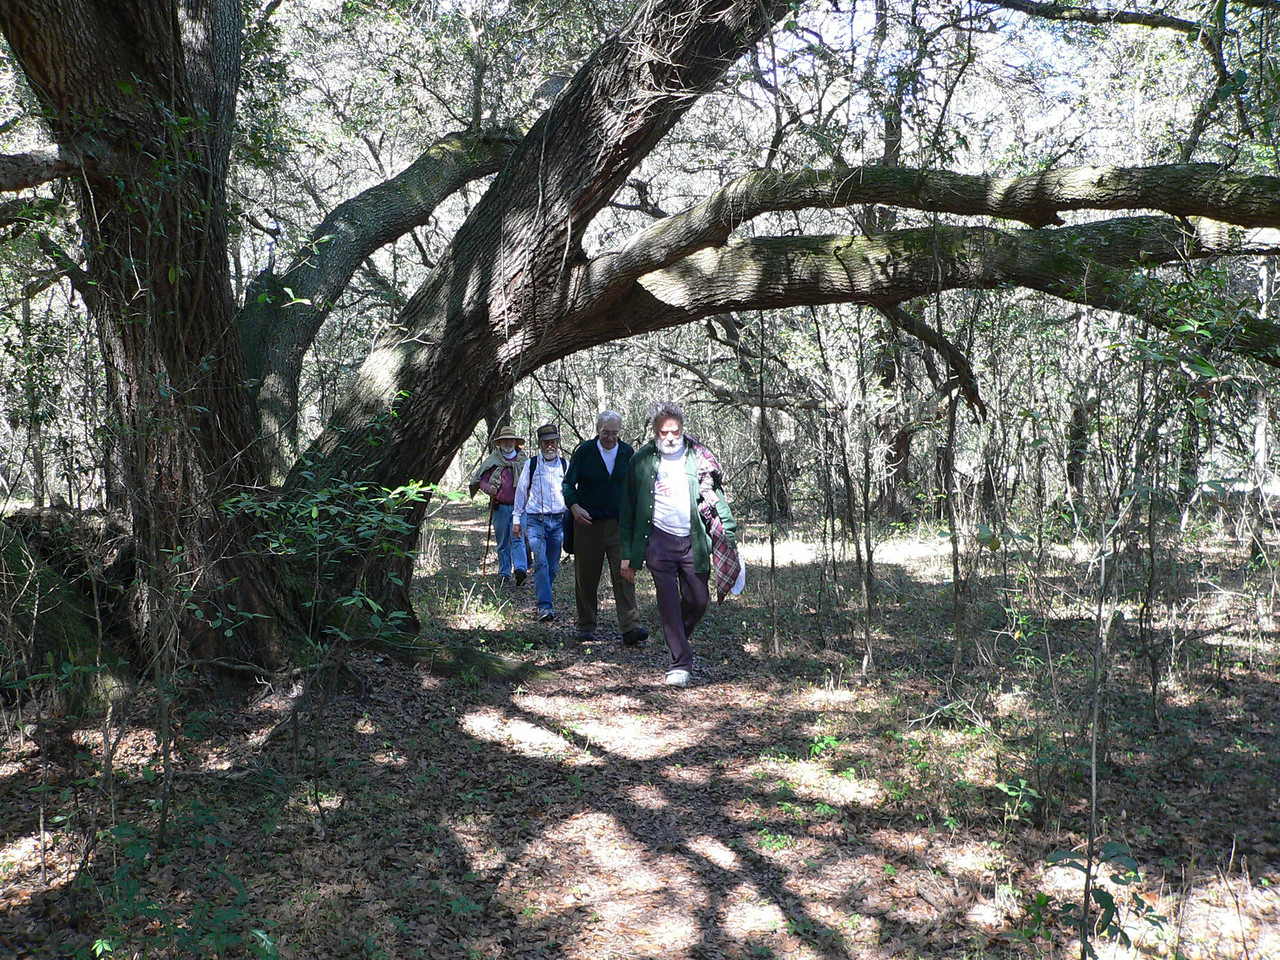 Hiking Spider Kingdom<br /> PHOTO CREDIT: Florida Trail Association / Diane Dammiller